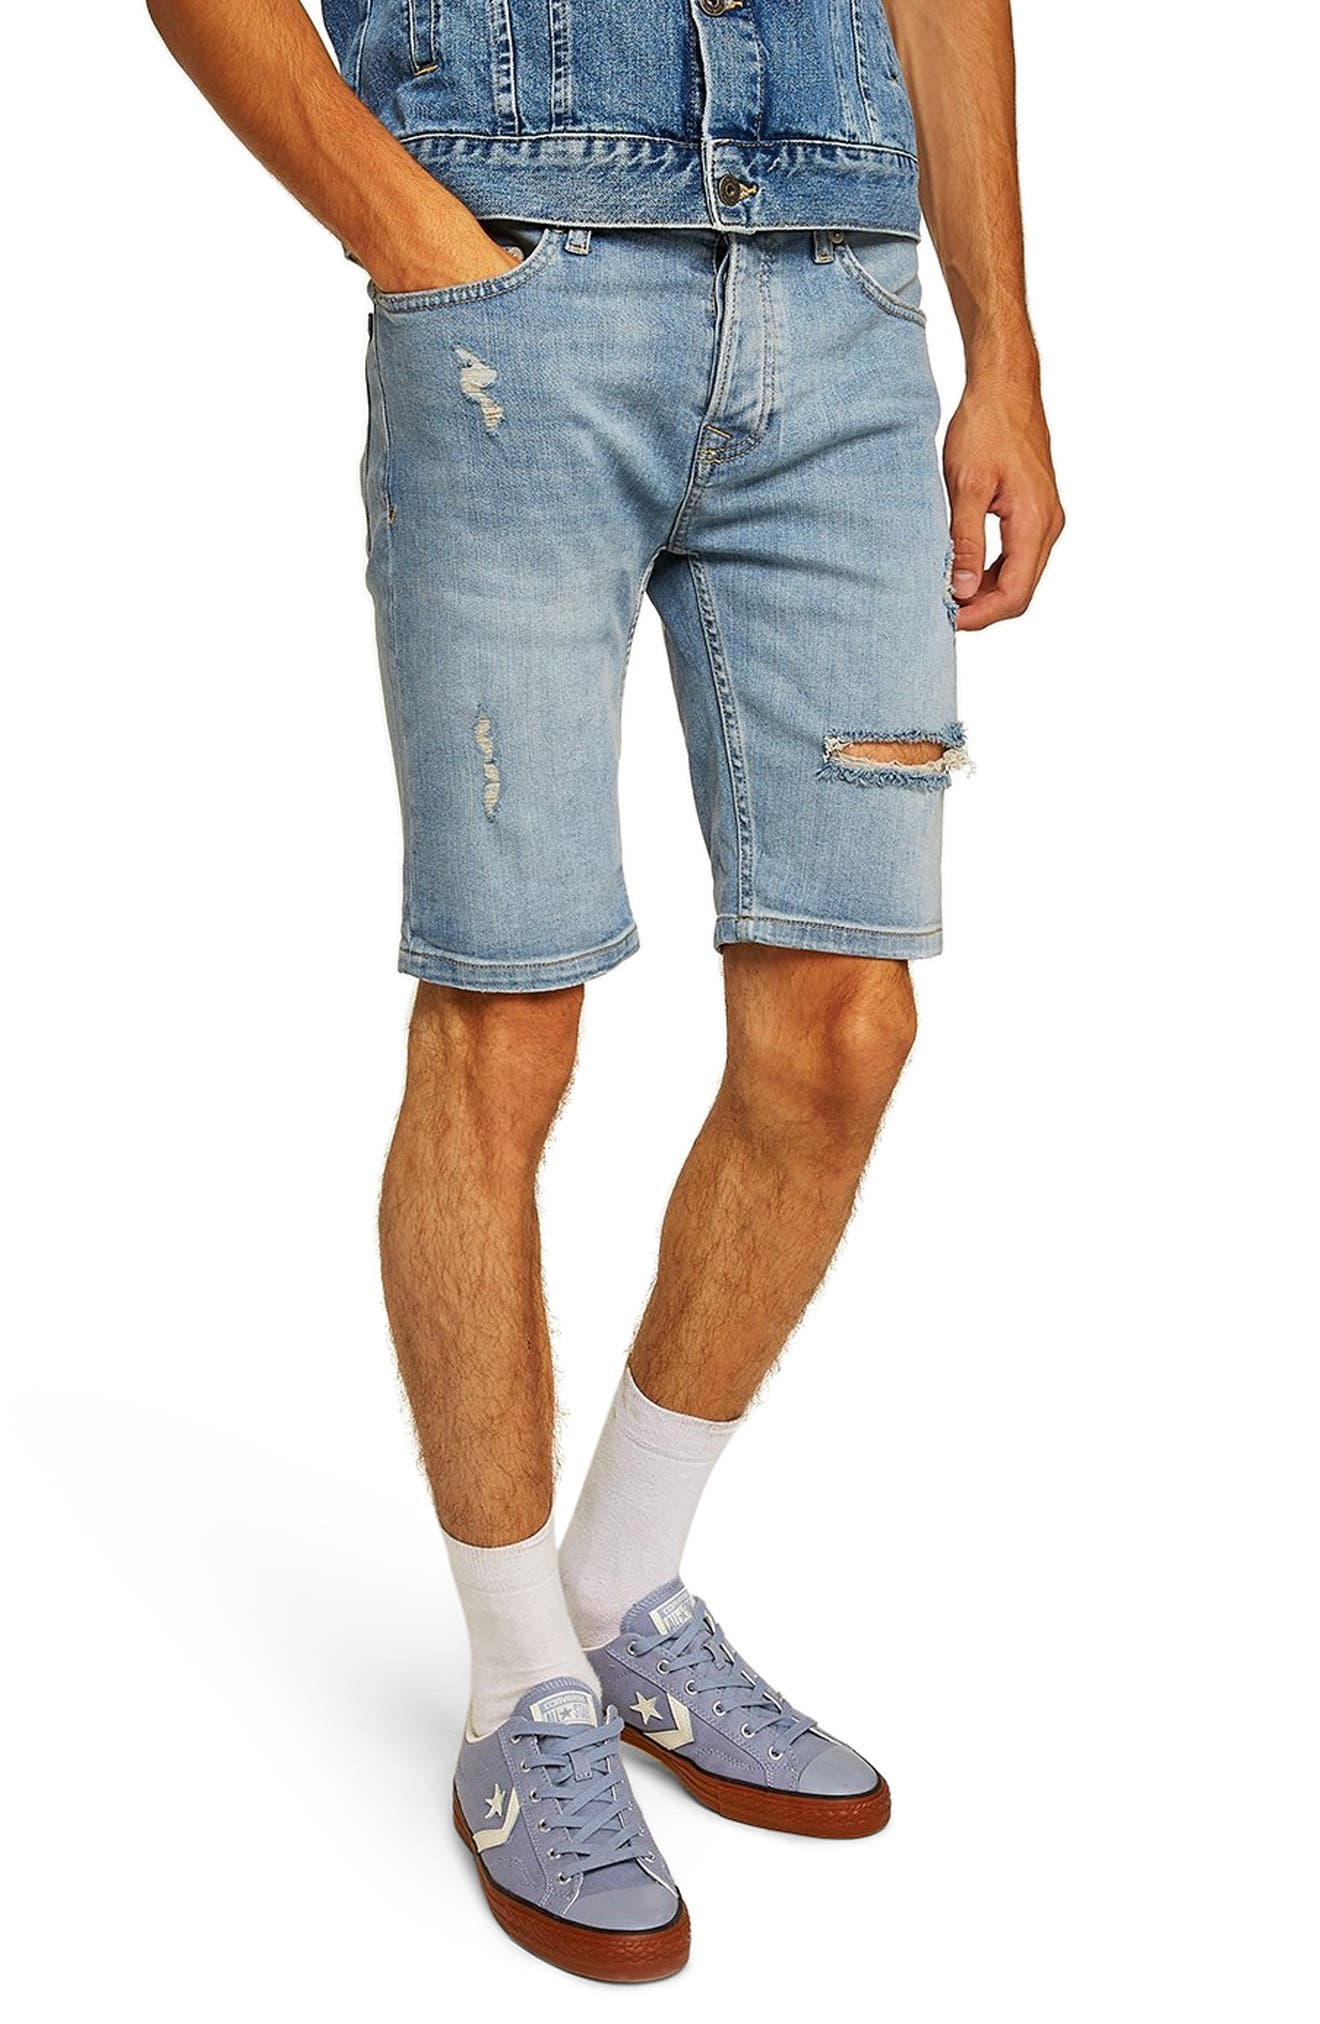 Bleach Ripped Skinny Denim Shorts,                             Main thumbnail 1, color,                             400